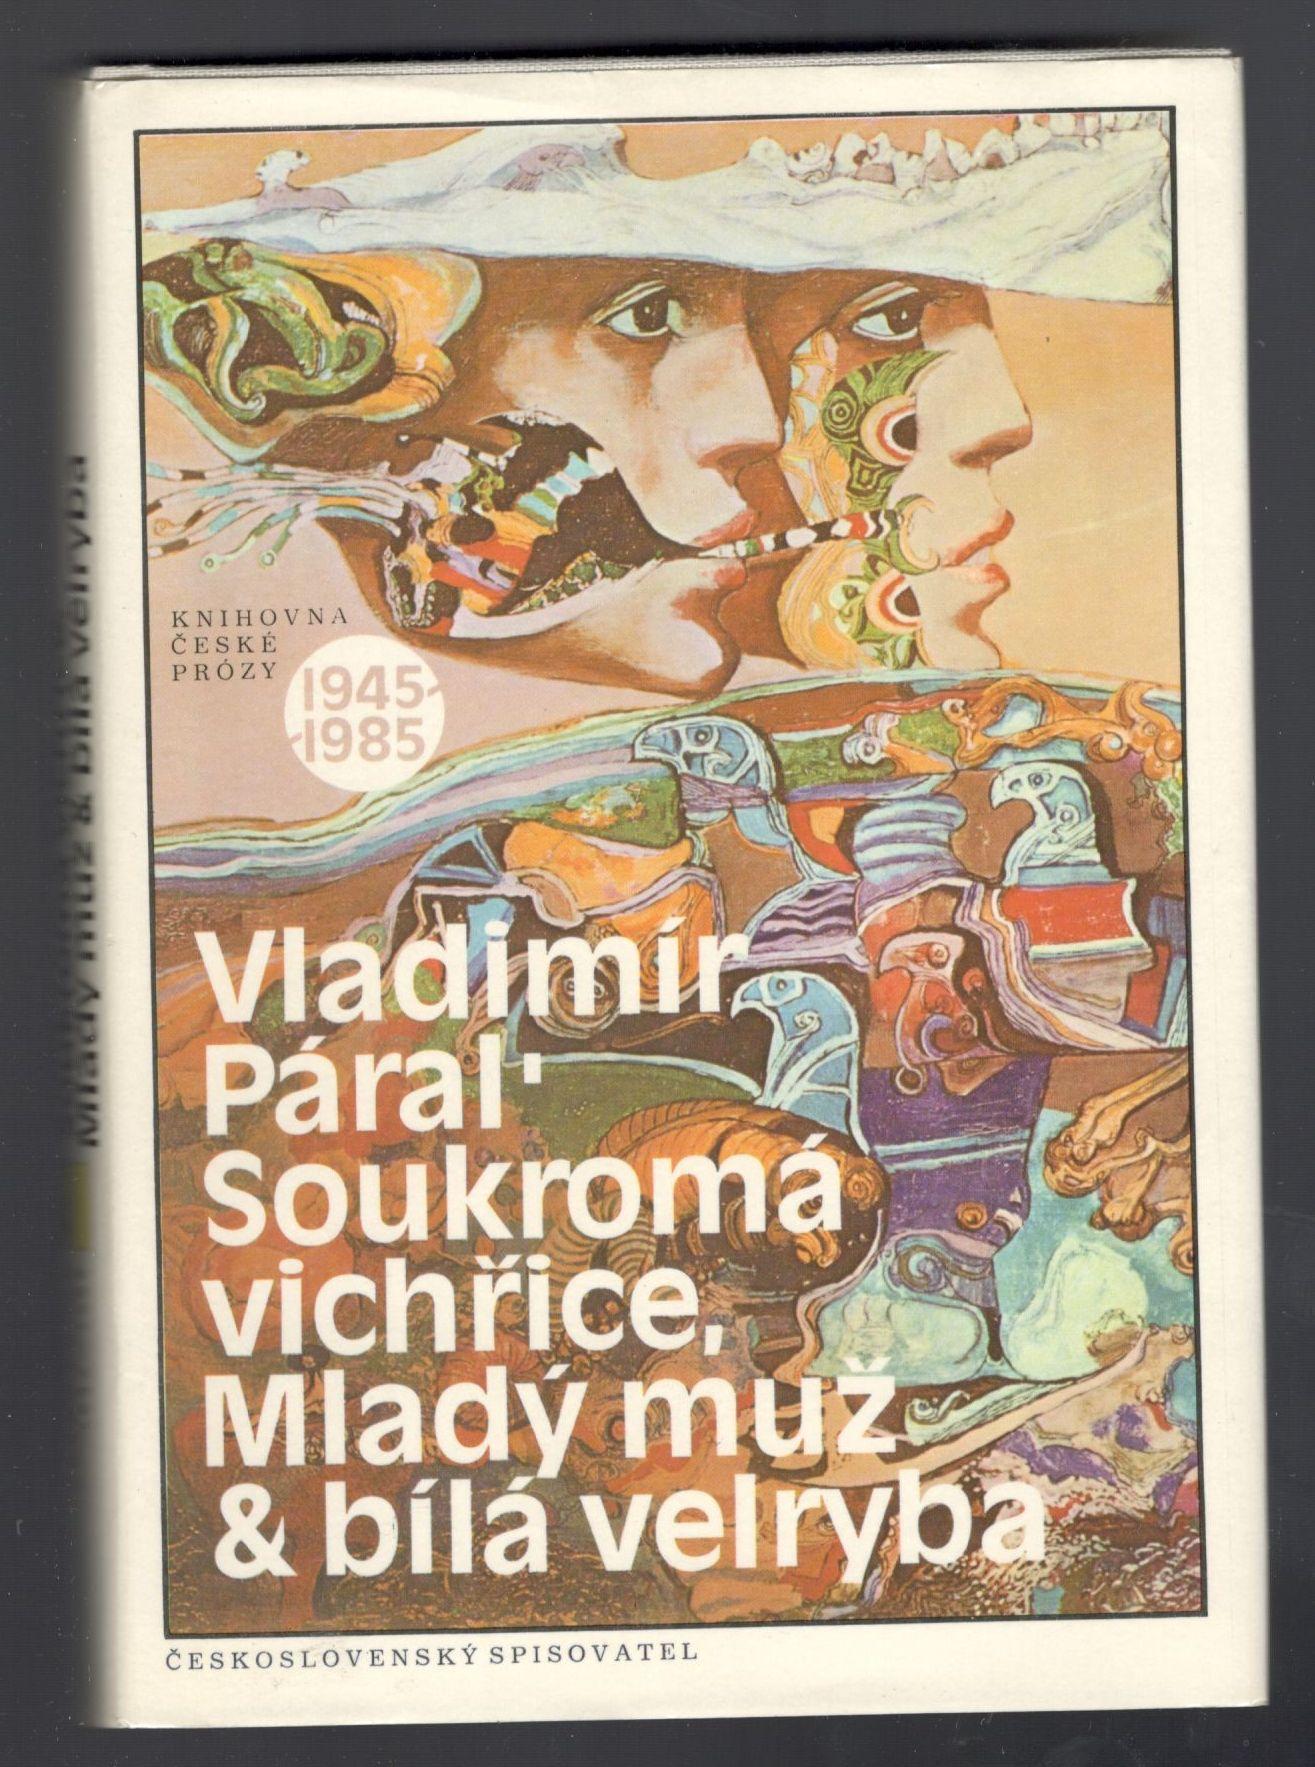 Soukromá vichřice, Mladý muž a bílá velryba - Vladimír Páral